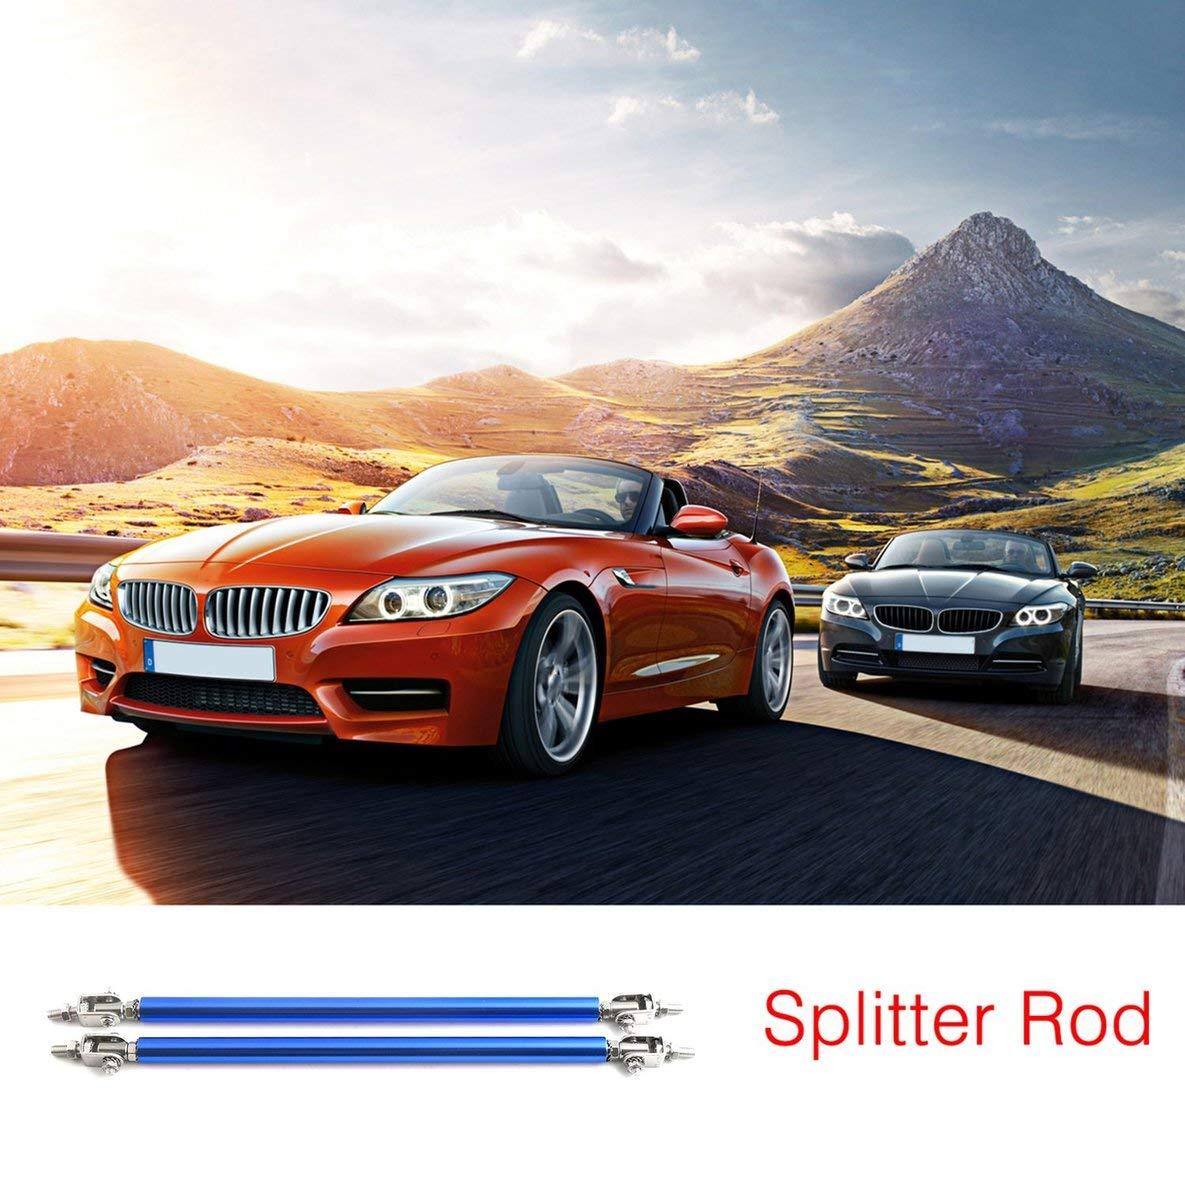 Romirofs 1 Pair Universal Car Front Back Bumper Splitter Lip Protectors Rod Stainless Steel Strut Rod Adjustable Support Bars